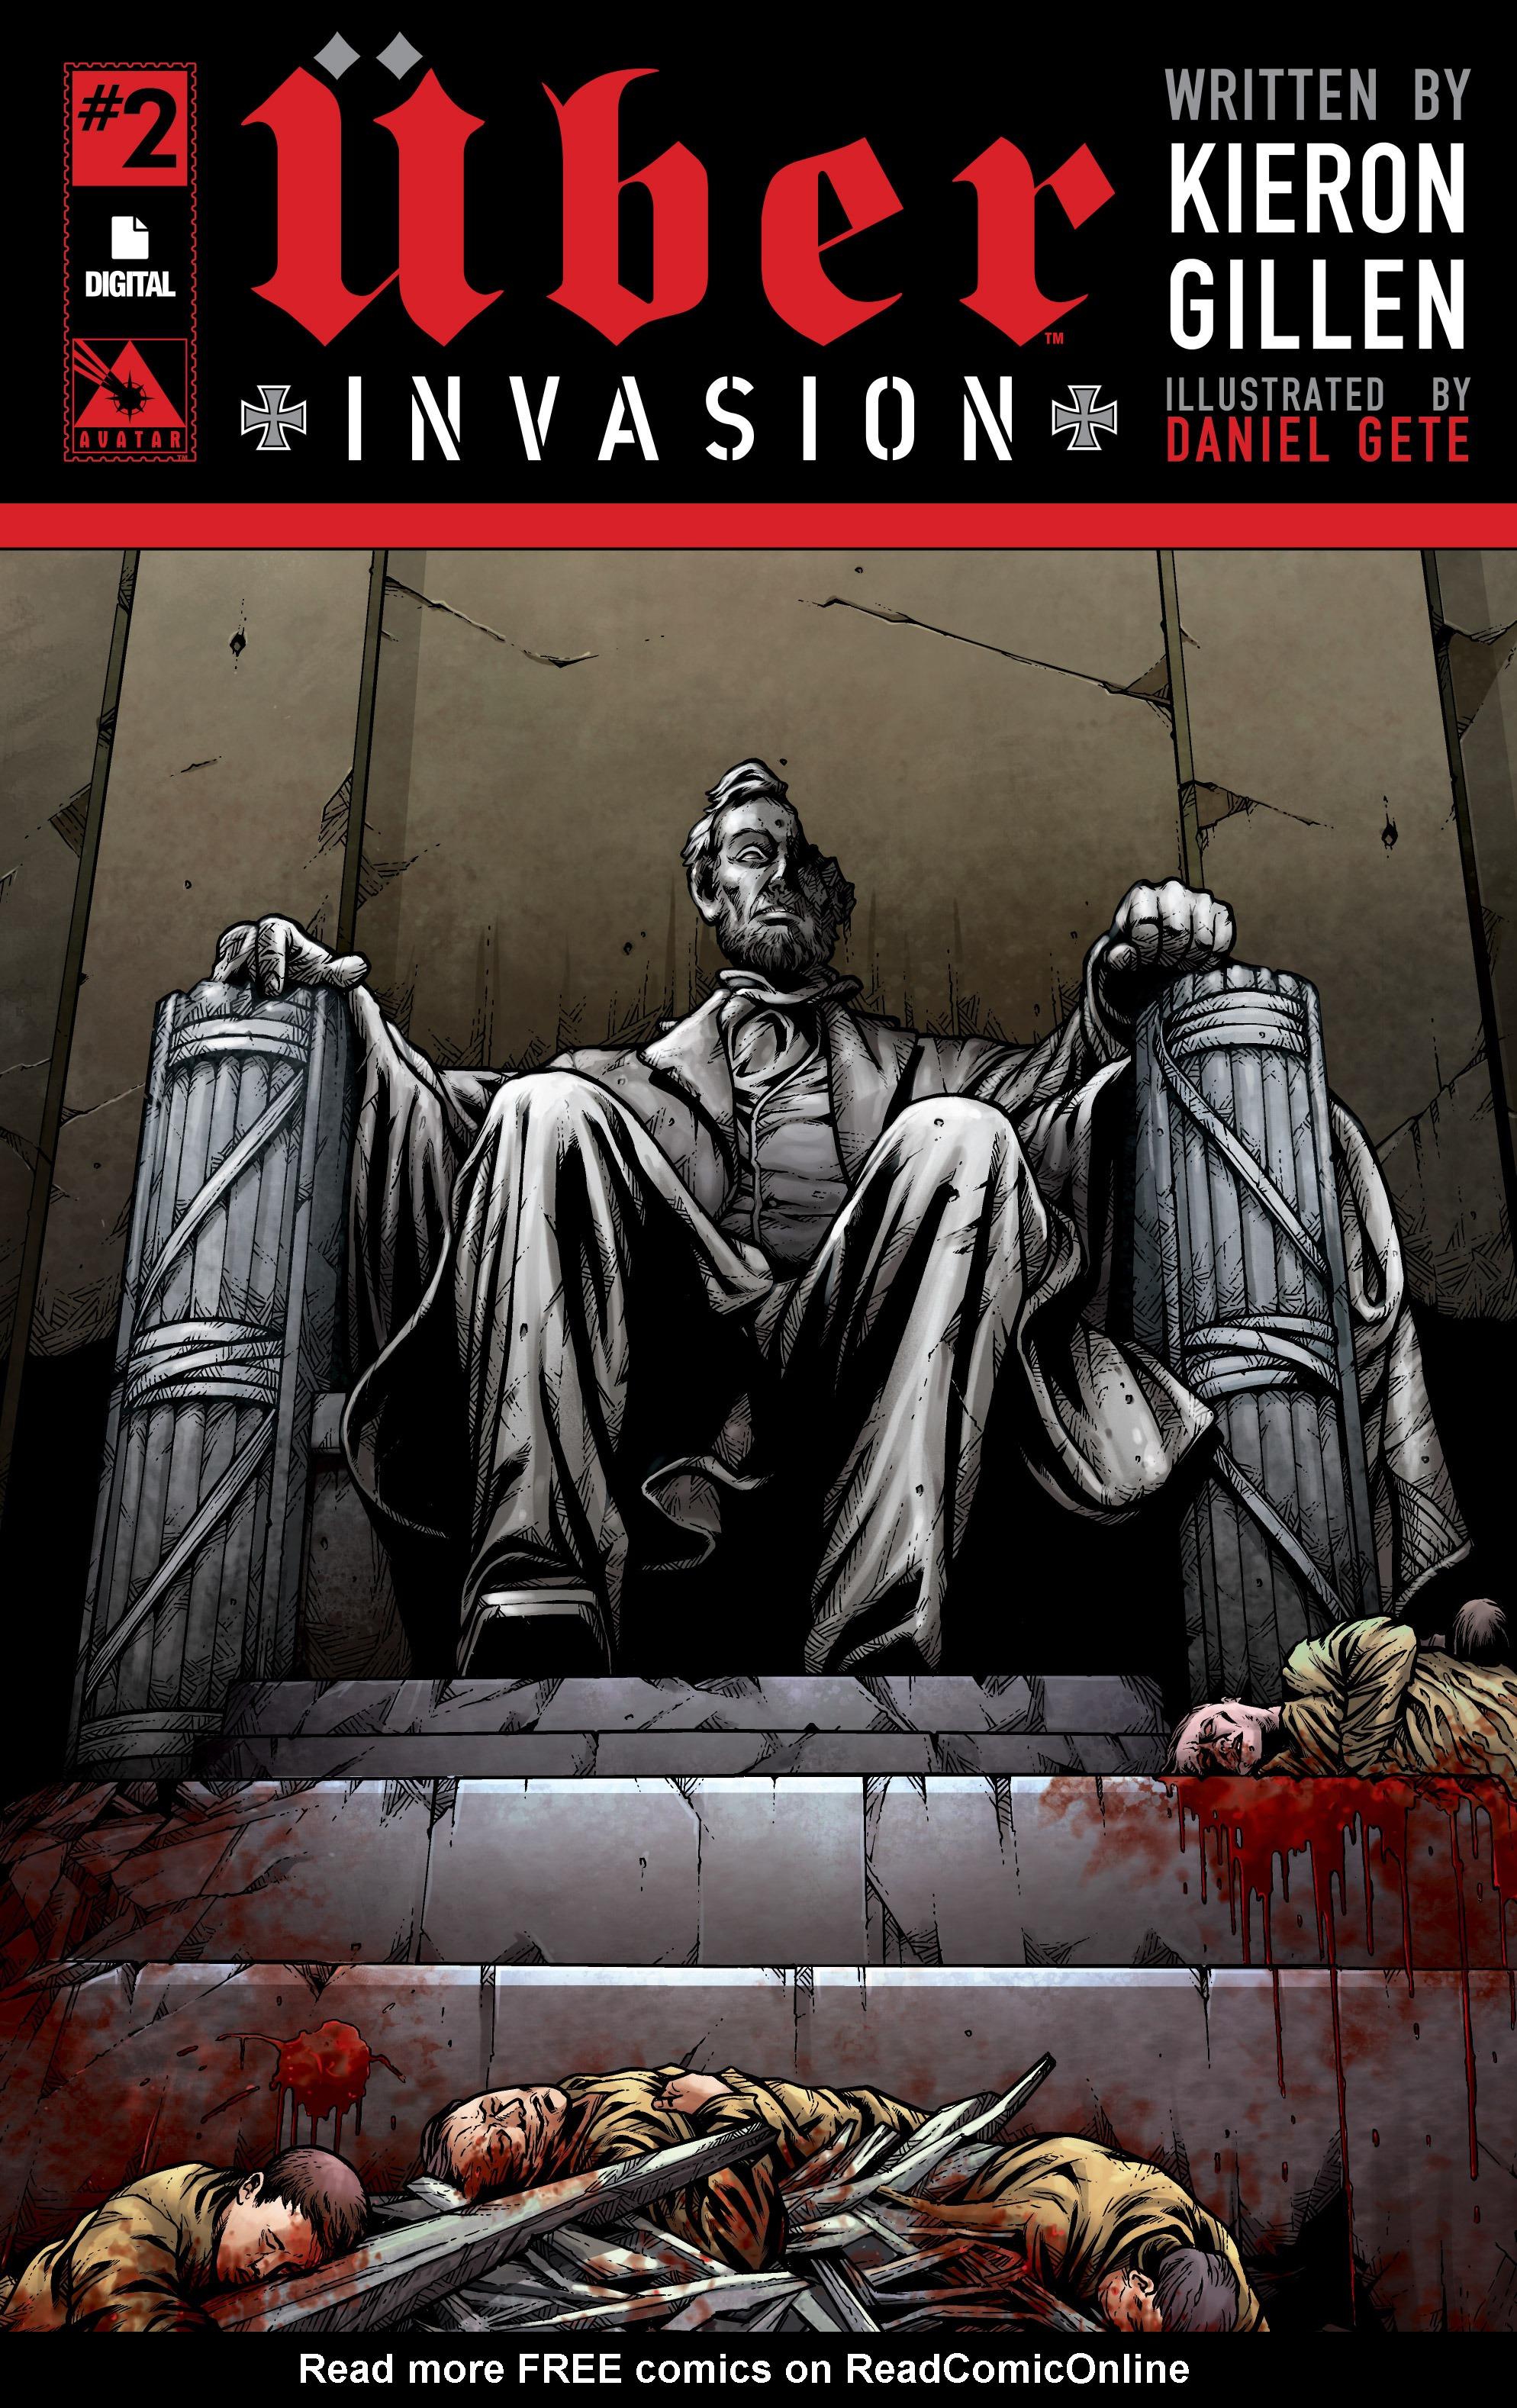 Read online Uber: Invasion comic -  Issue #2 - 1